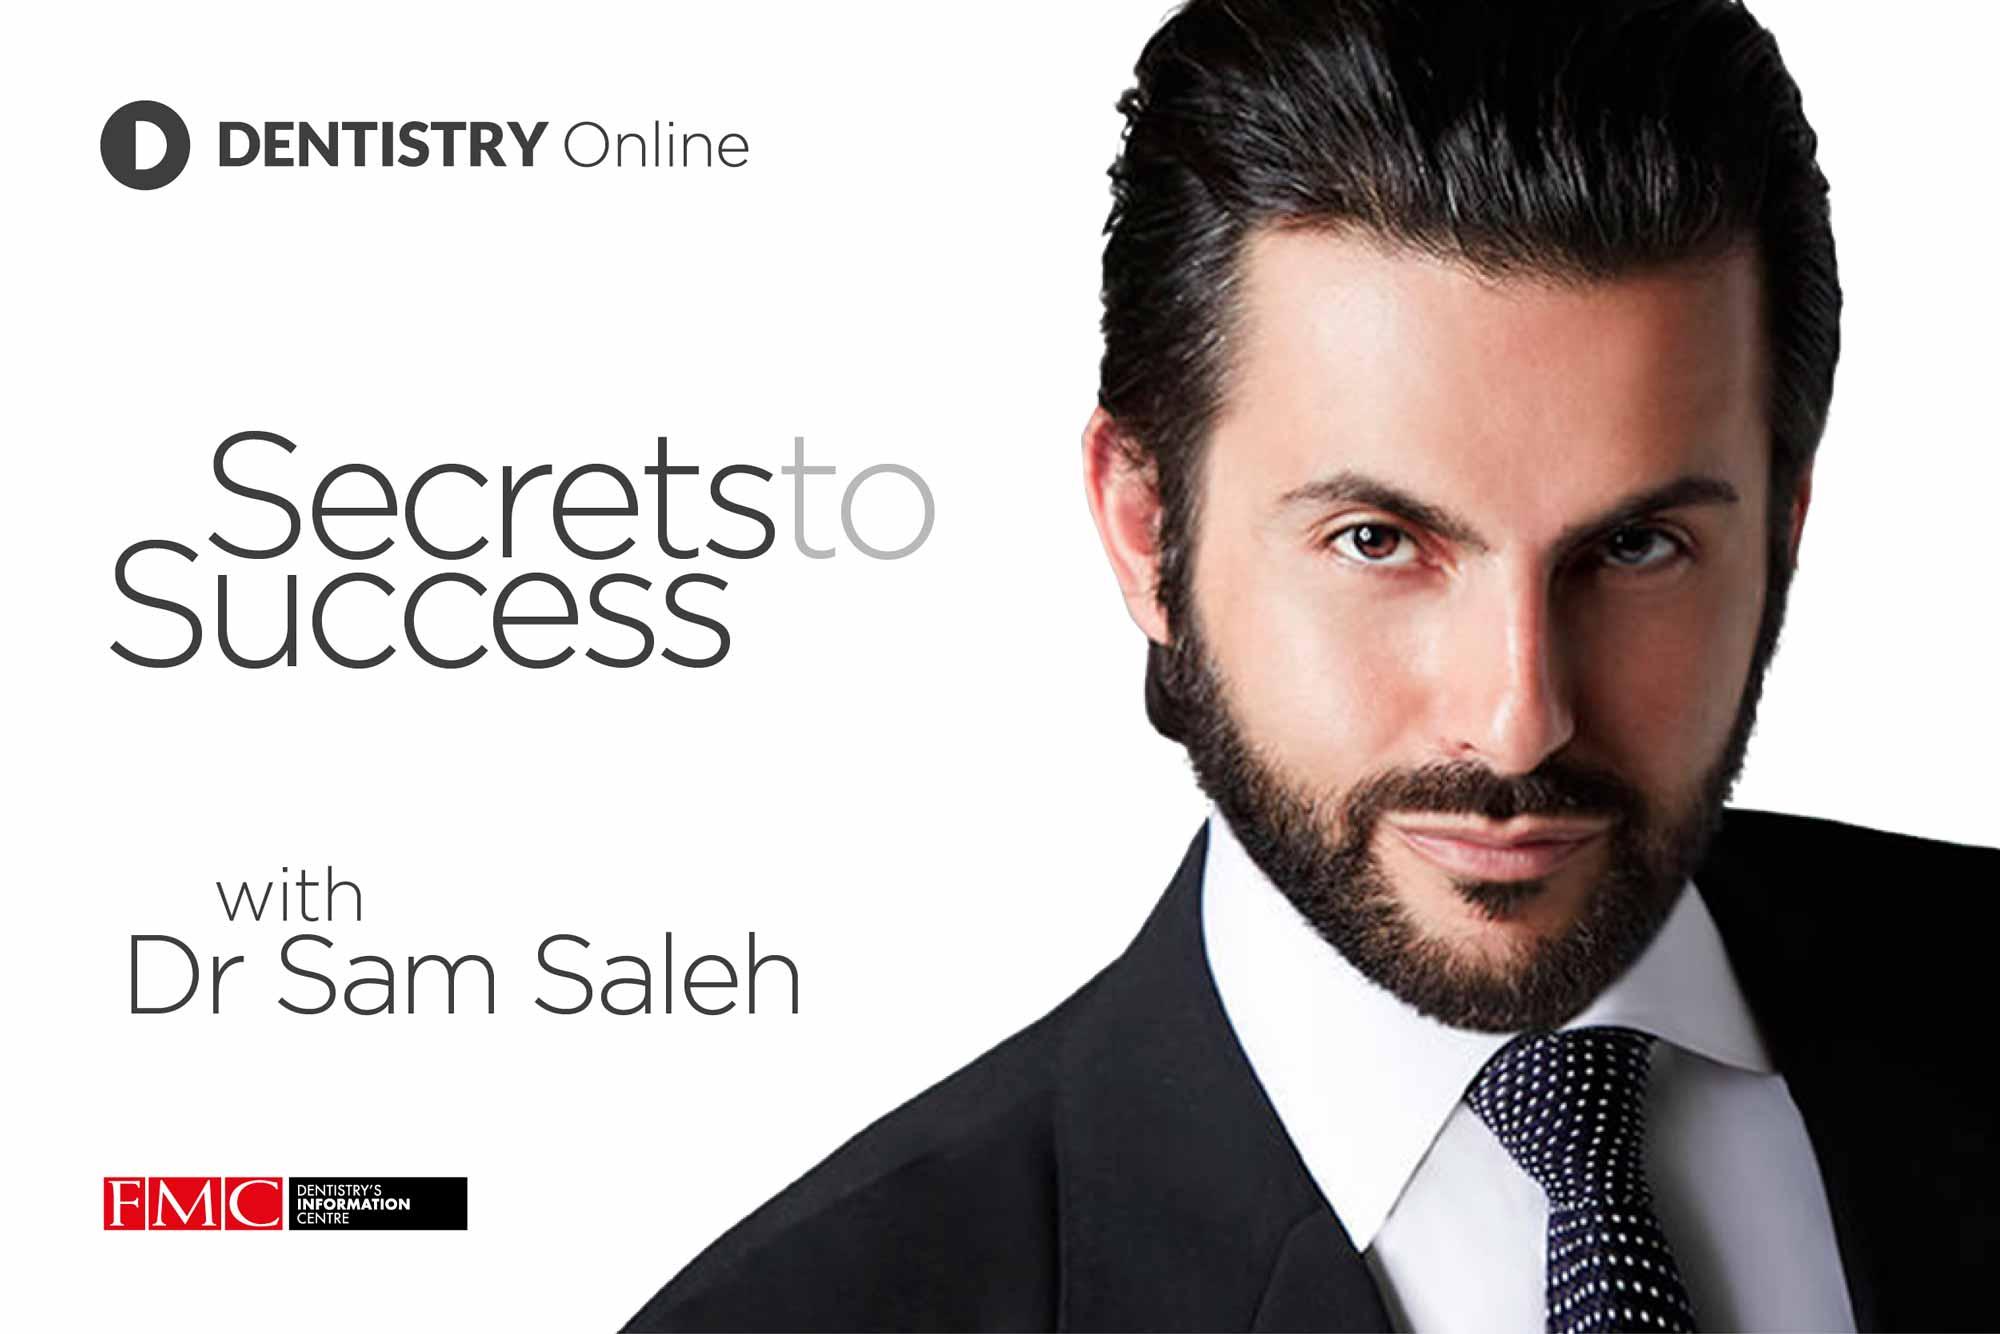 Secrets to success Sam Saleh